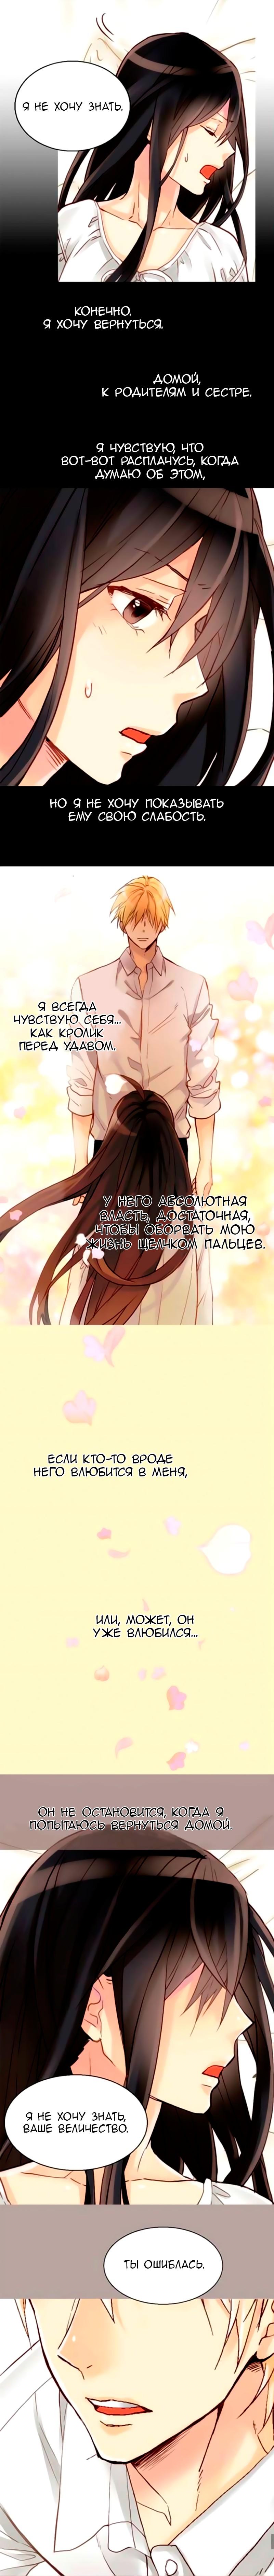 https://r2.ninemanga.com/comics/pic3/14/22798/1309319/1549154968503.jpg Page 2